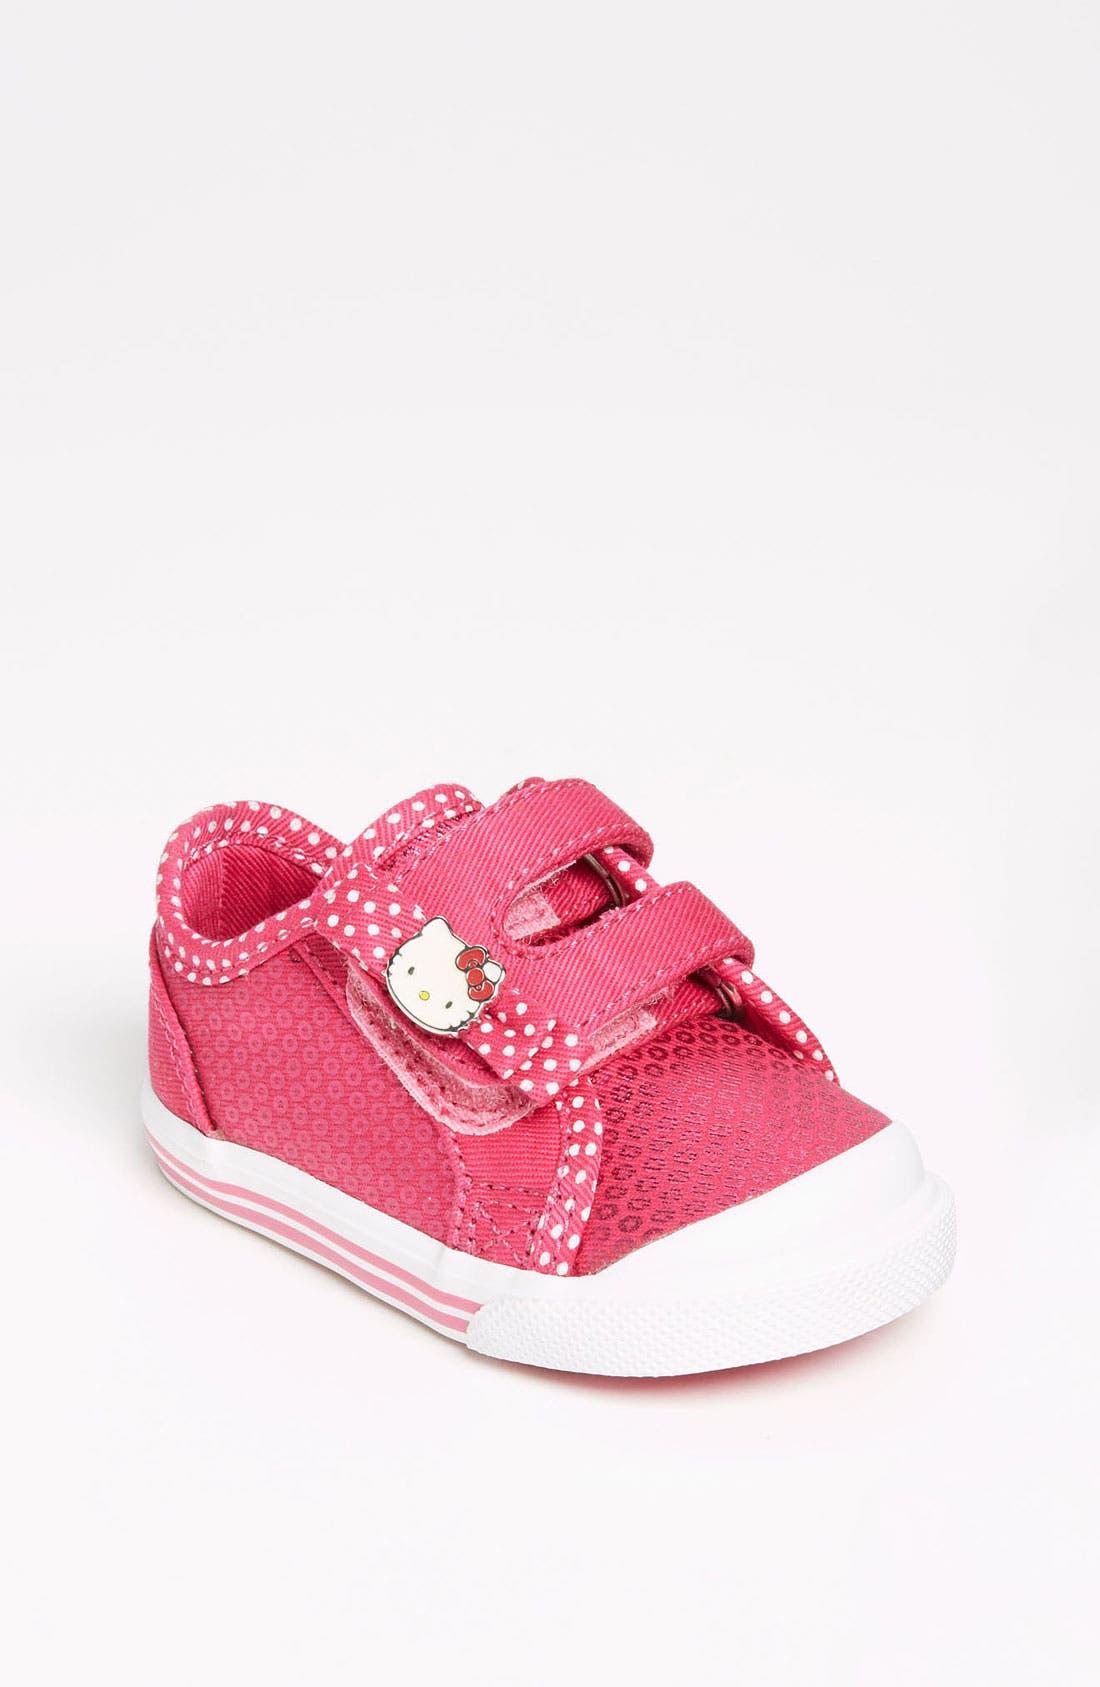 Main Image - Keds® 'Mimmy' Crib Shoe (Baby)